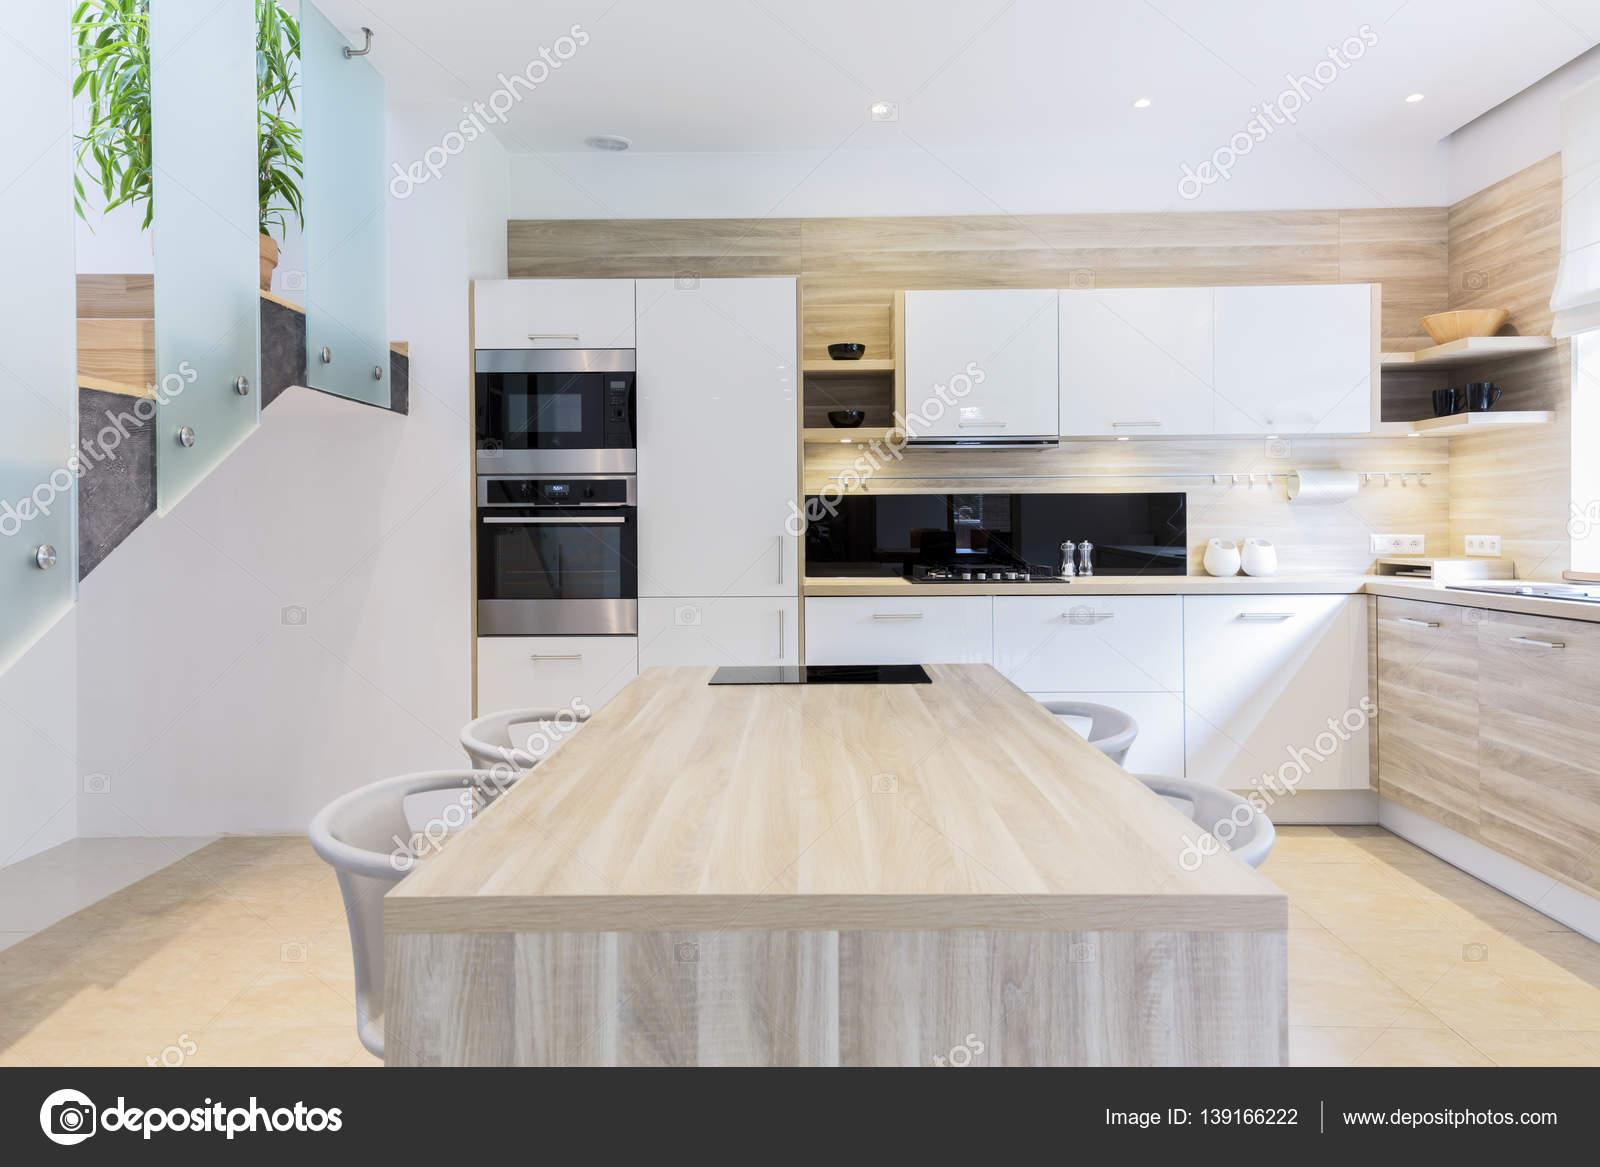 Moderne Keuken Kleuren : Ingerichte keuken in lichte kleuren u2014 stockfoto © photographee.eu